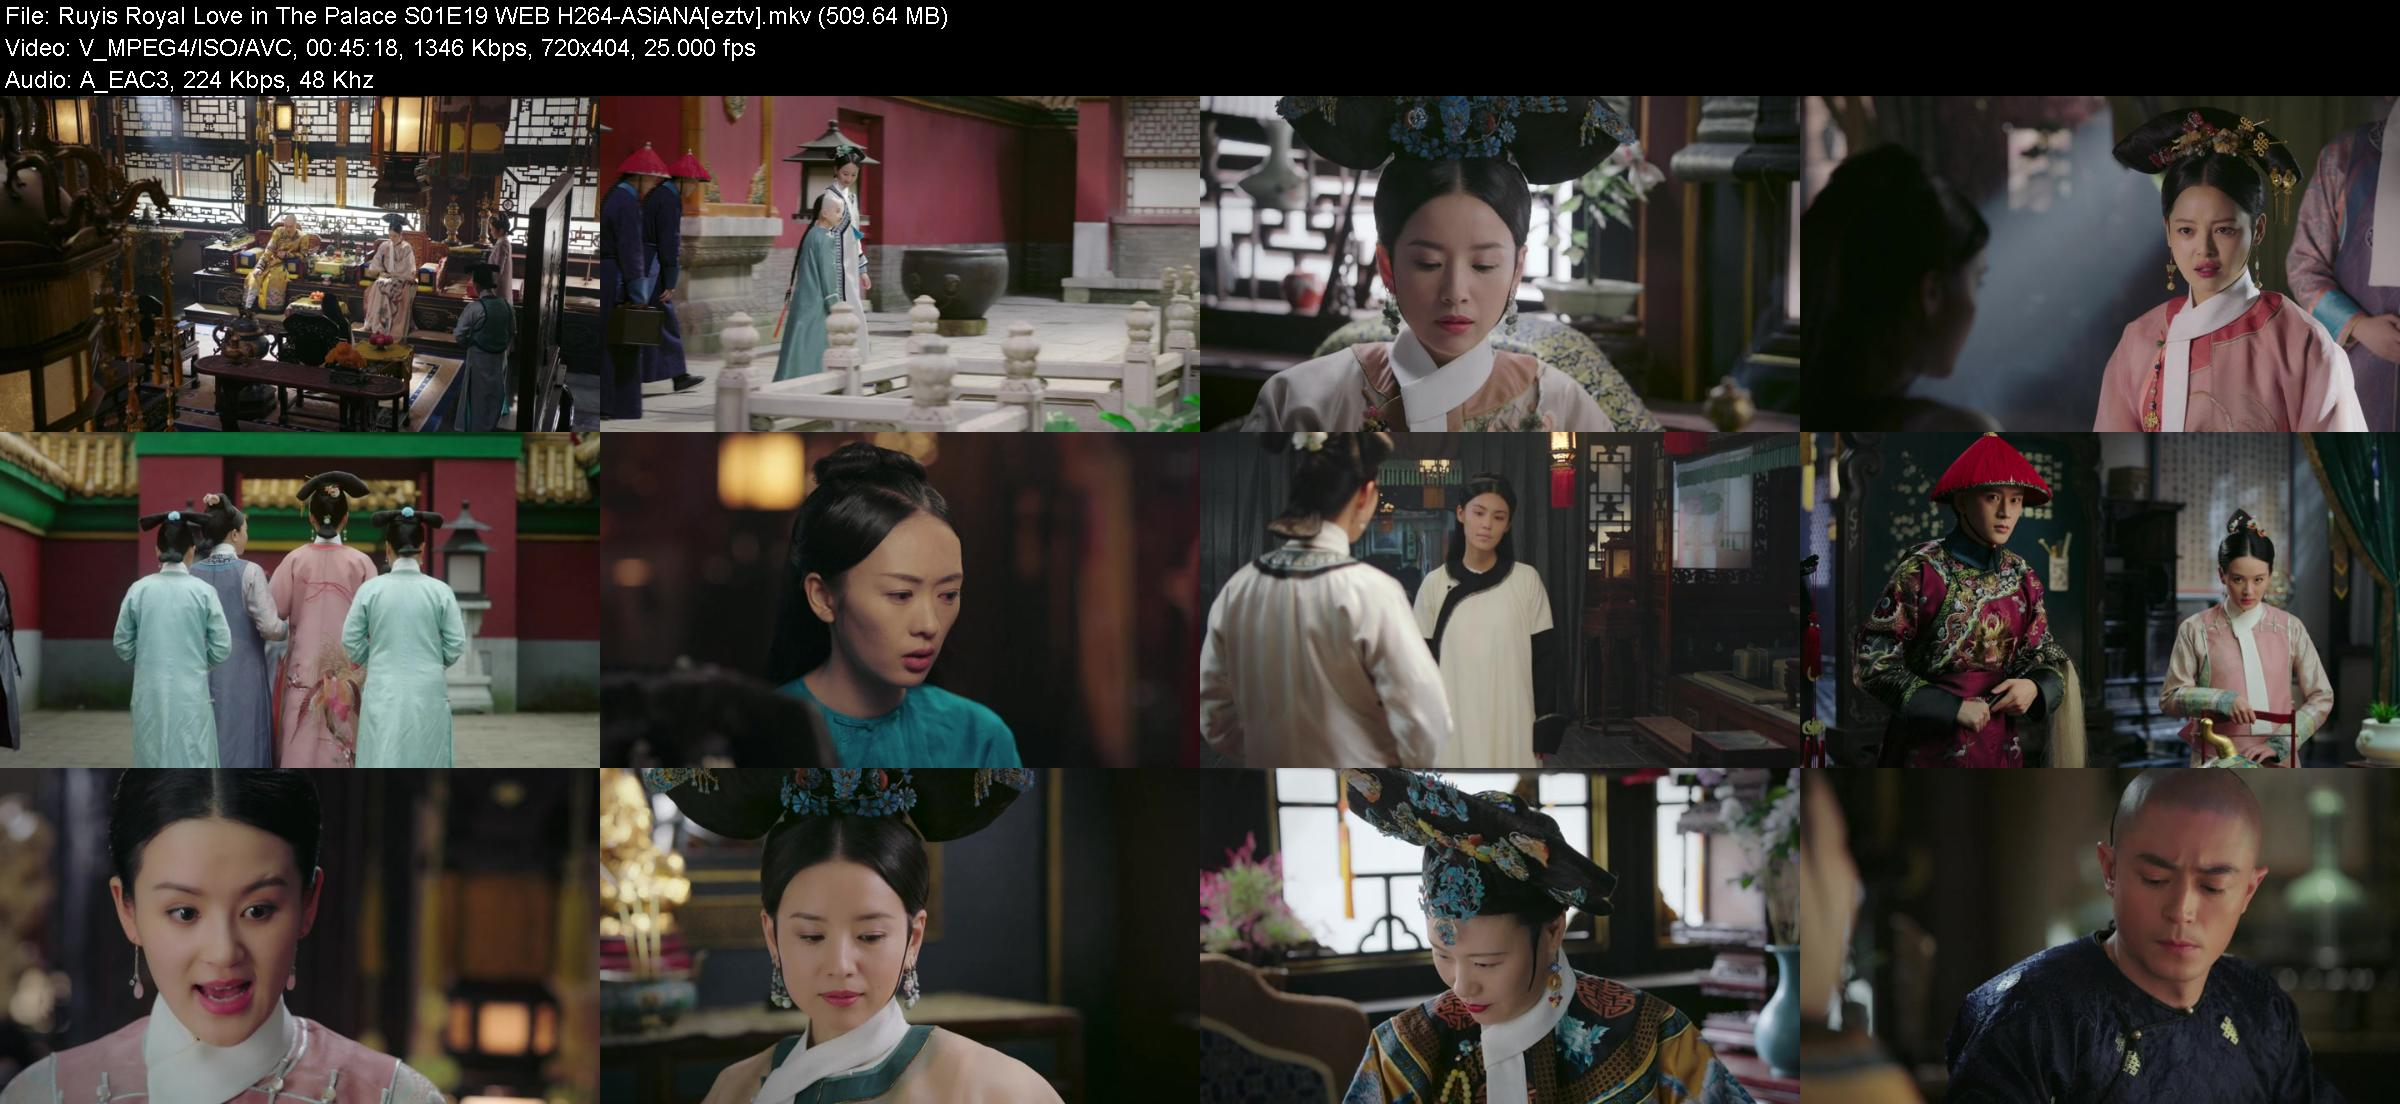 [Bild: 120877182_ruyis-royal-love-in-the-palace...asiana.jpg]